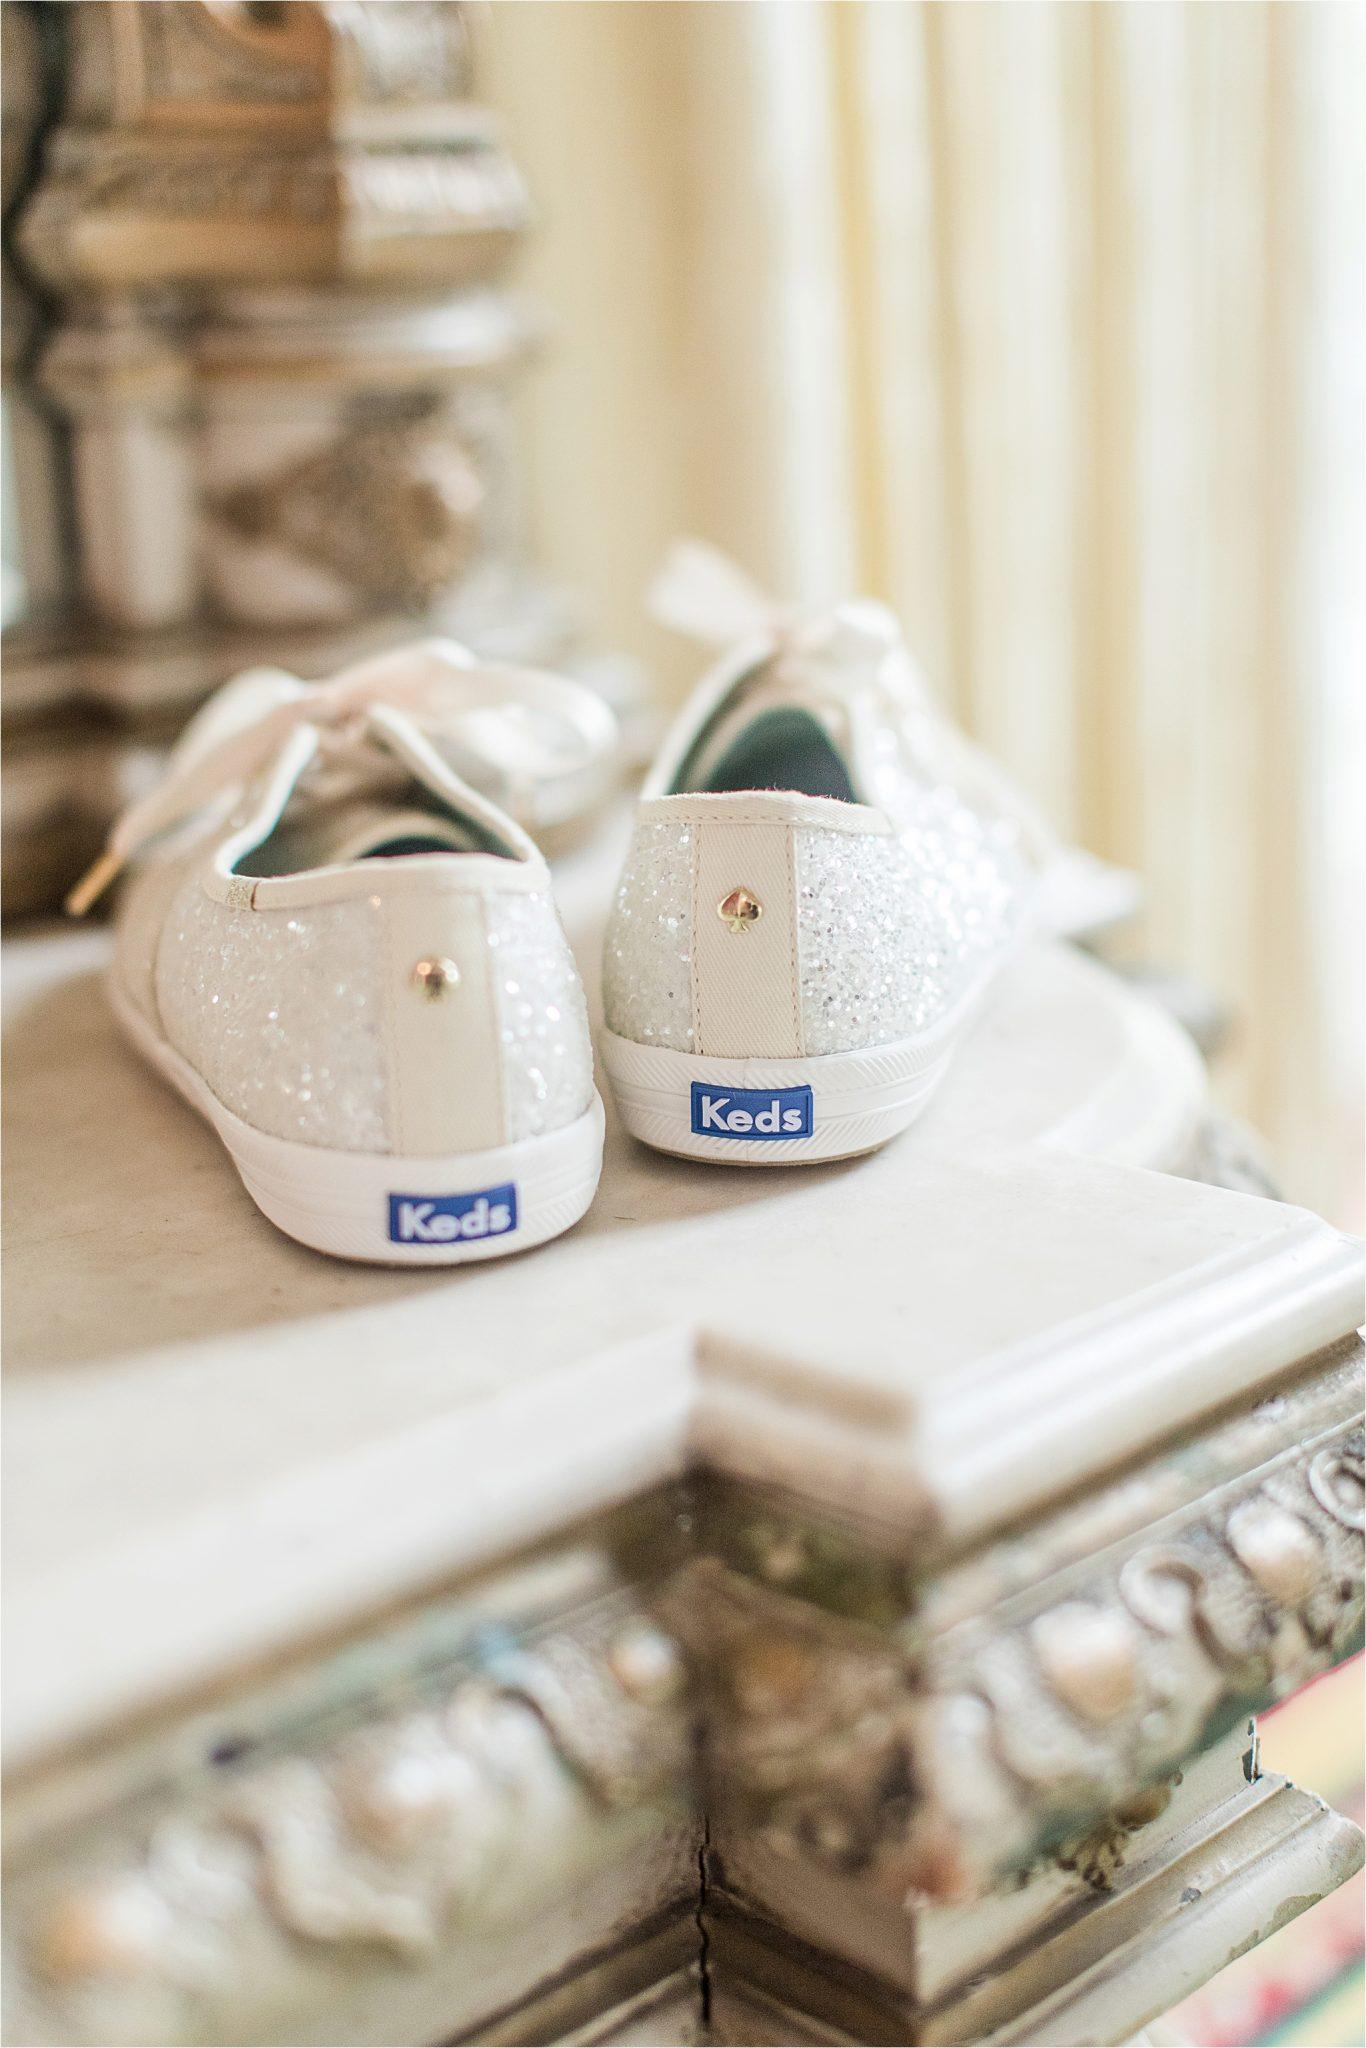 sparkly keds-bridal keds-bridal shoes-diamond studded kids-white-shinny